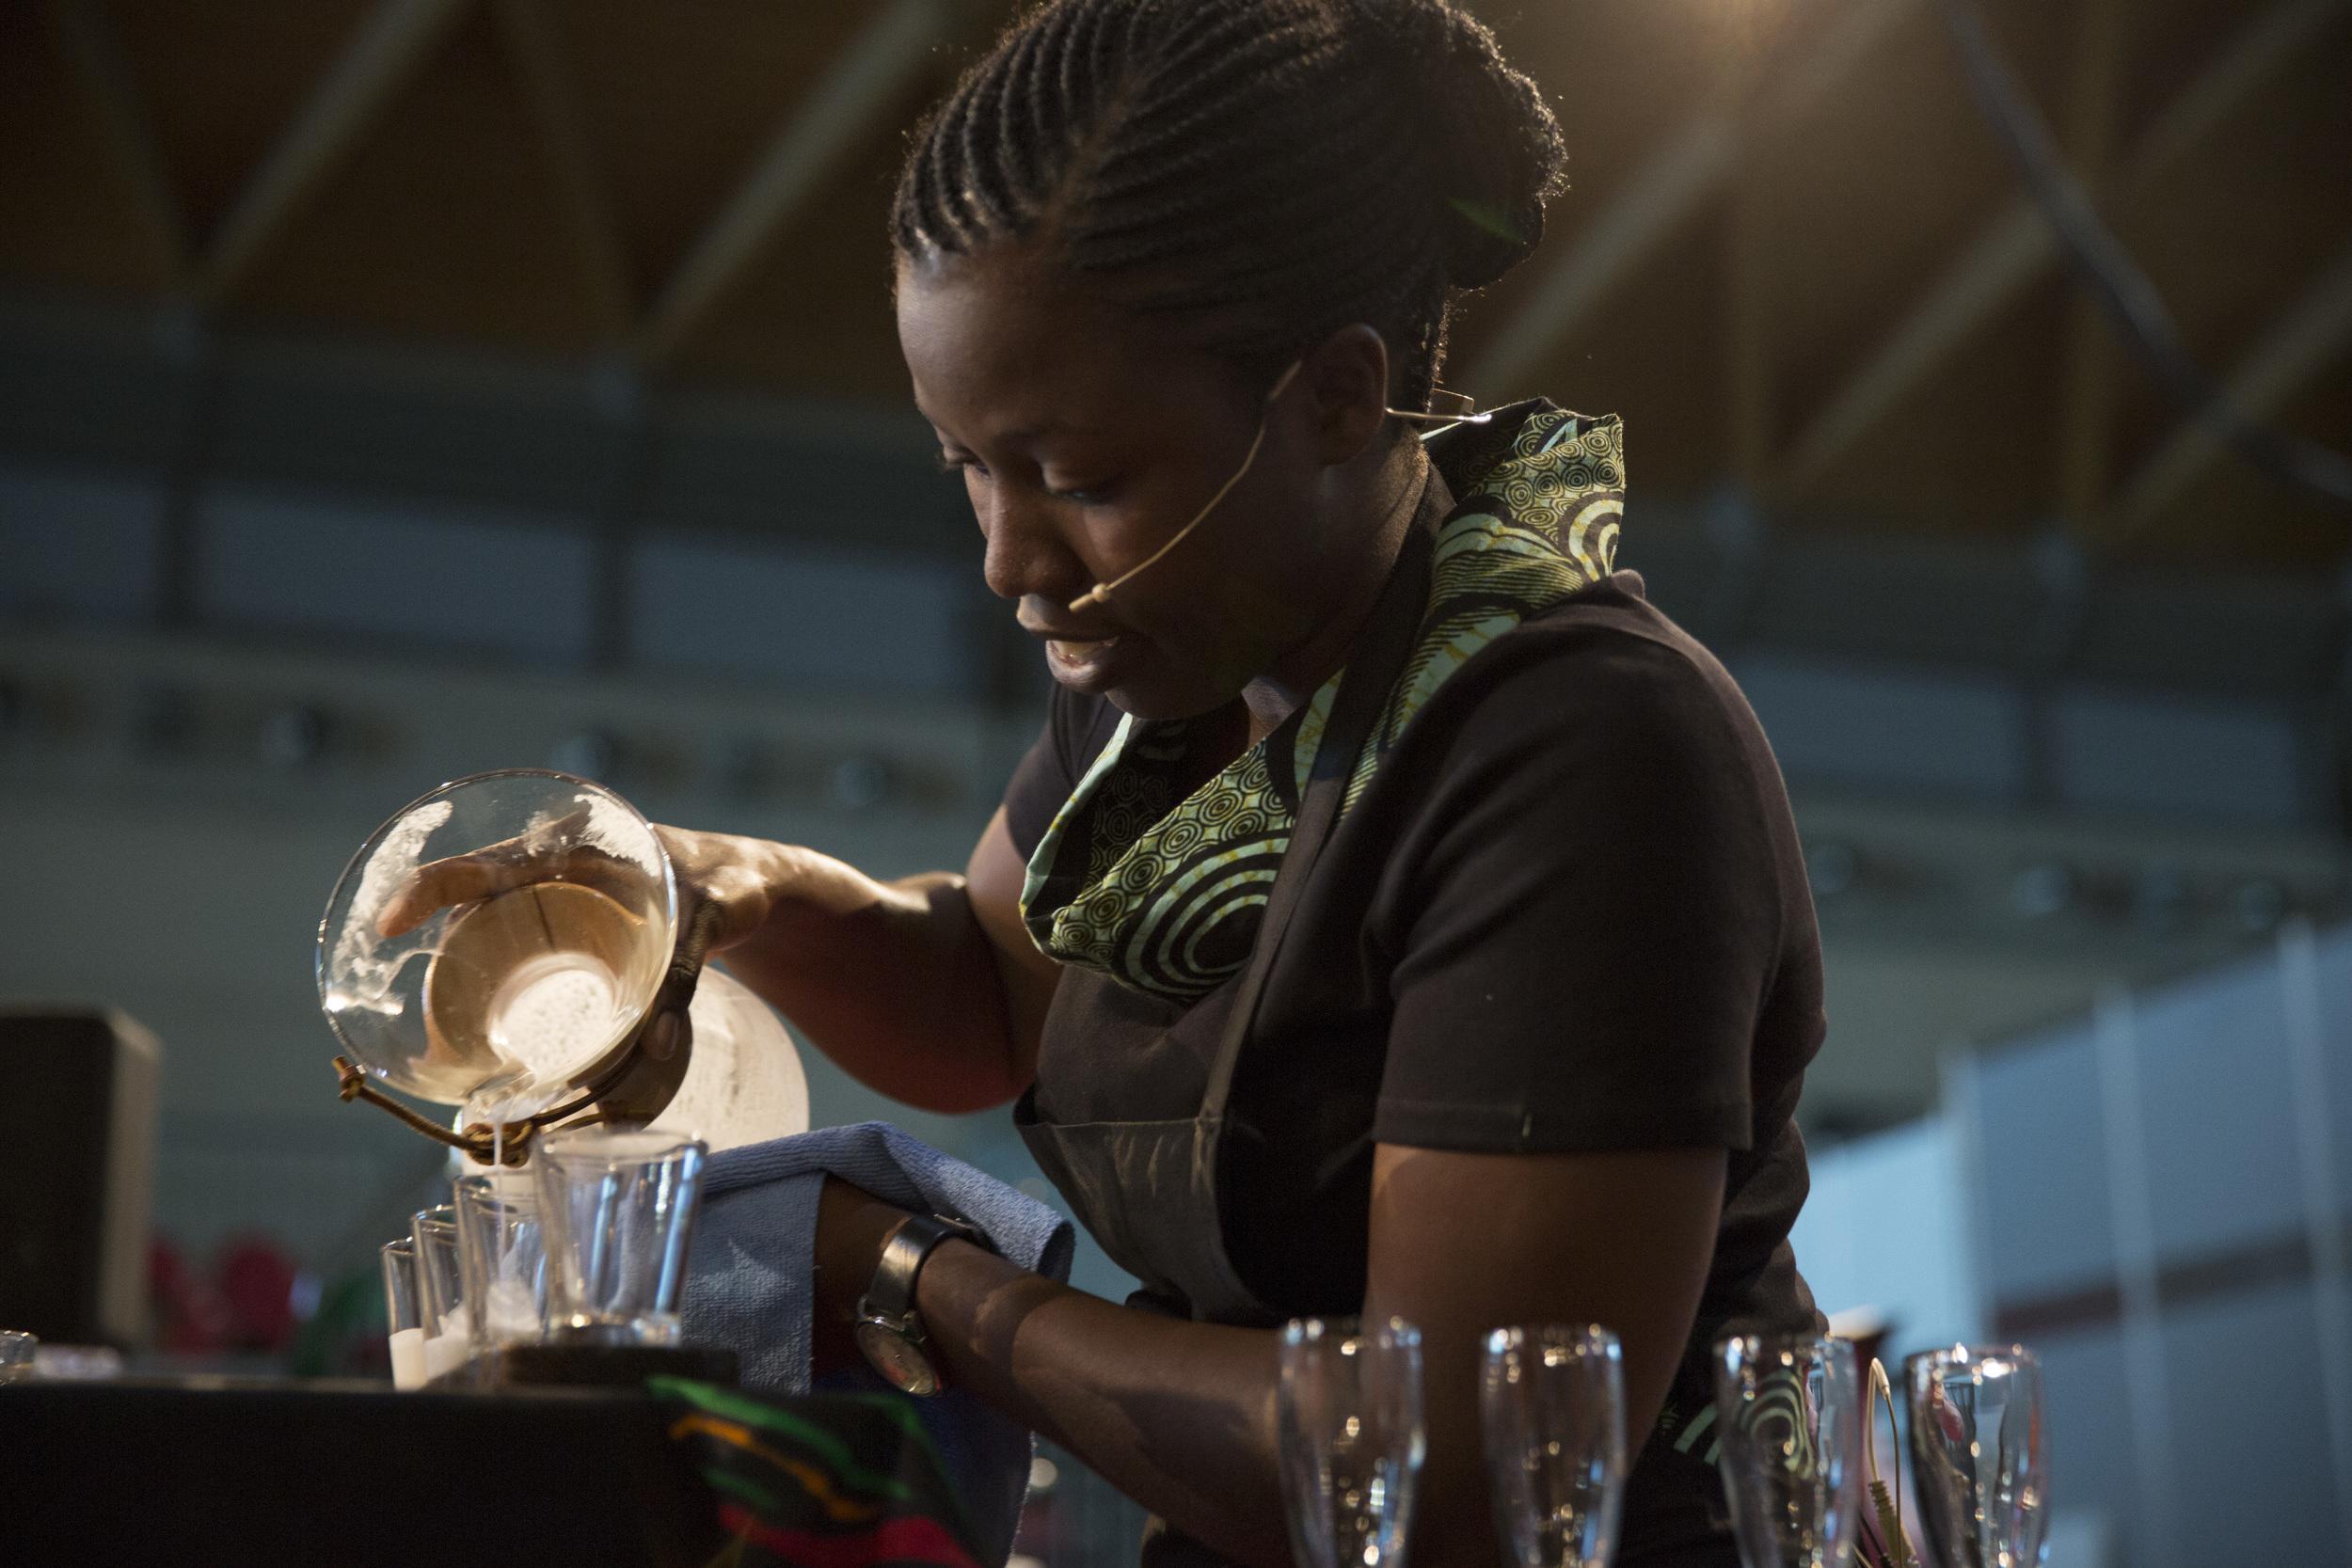 55-WCE-worldcoffeeevents-worldbaristachampionship2014-zambia-Dailess Nalwamba-christinasolomonsphotography.jpg